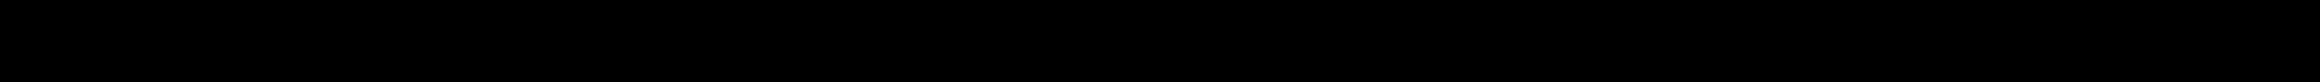 HAZET 3122 B, T20028, 3122B Zündkerzenschlüssel